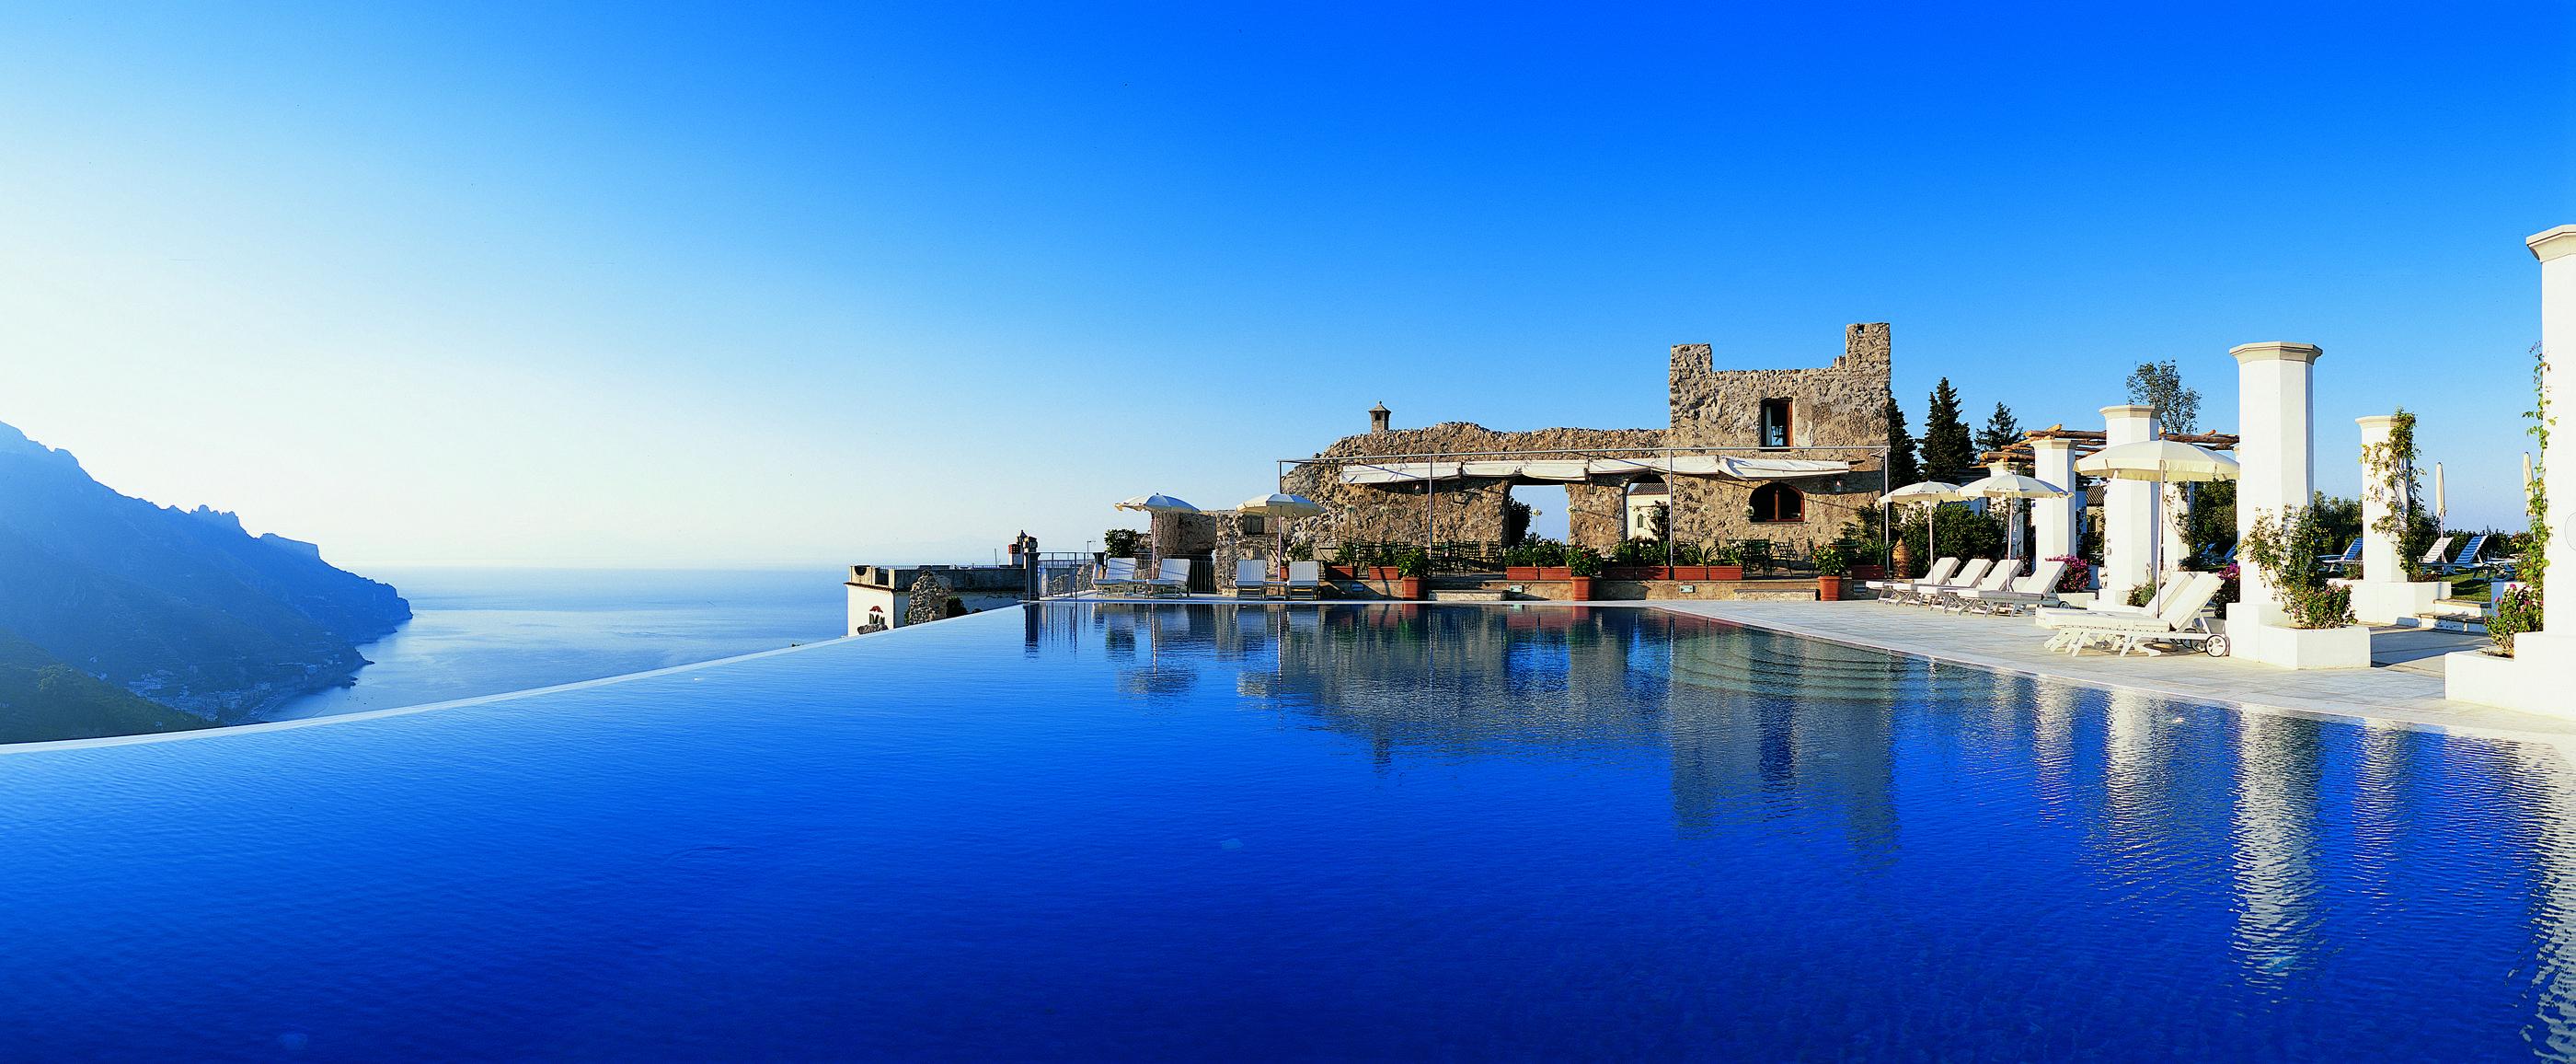 Infinity Pool Deutschland belmond hotel caruso italie luxury hotel amalfi